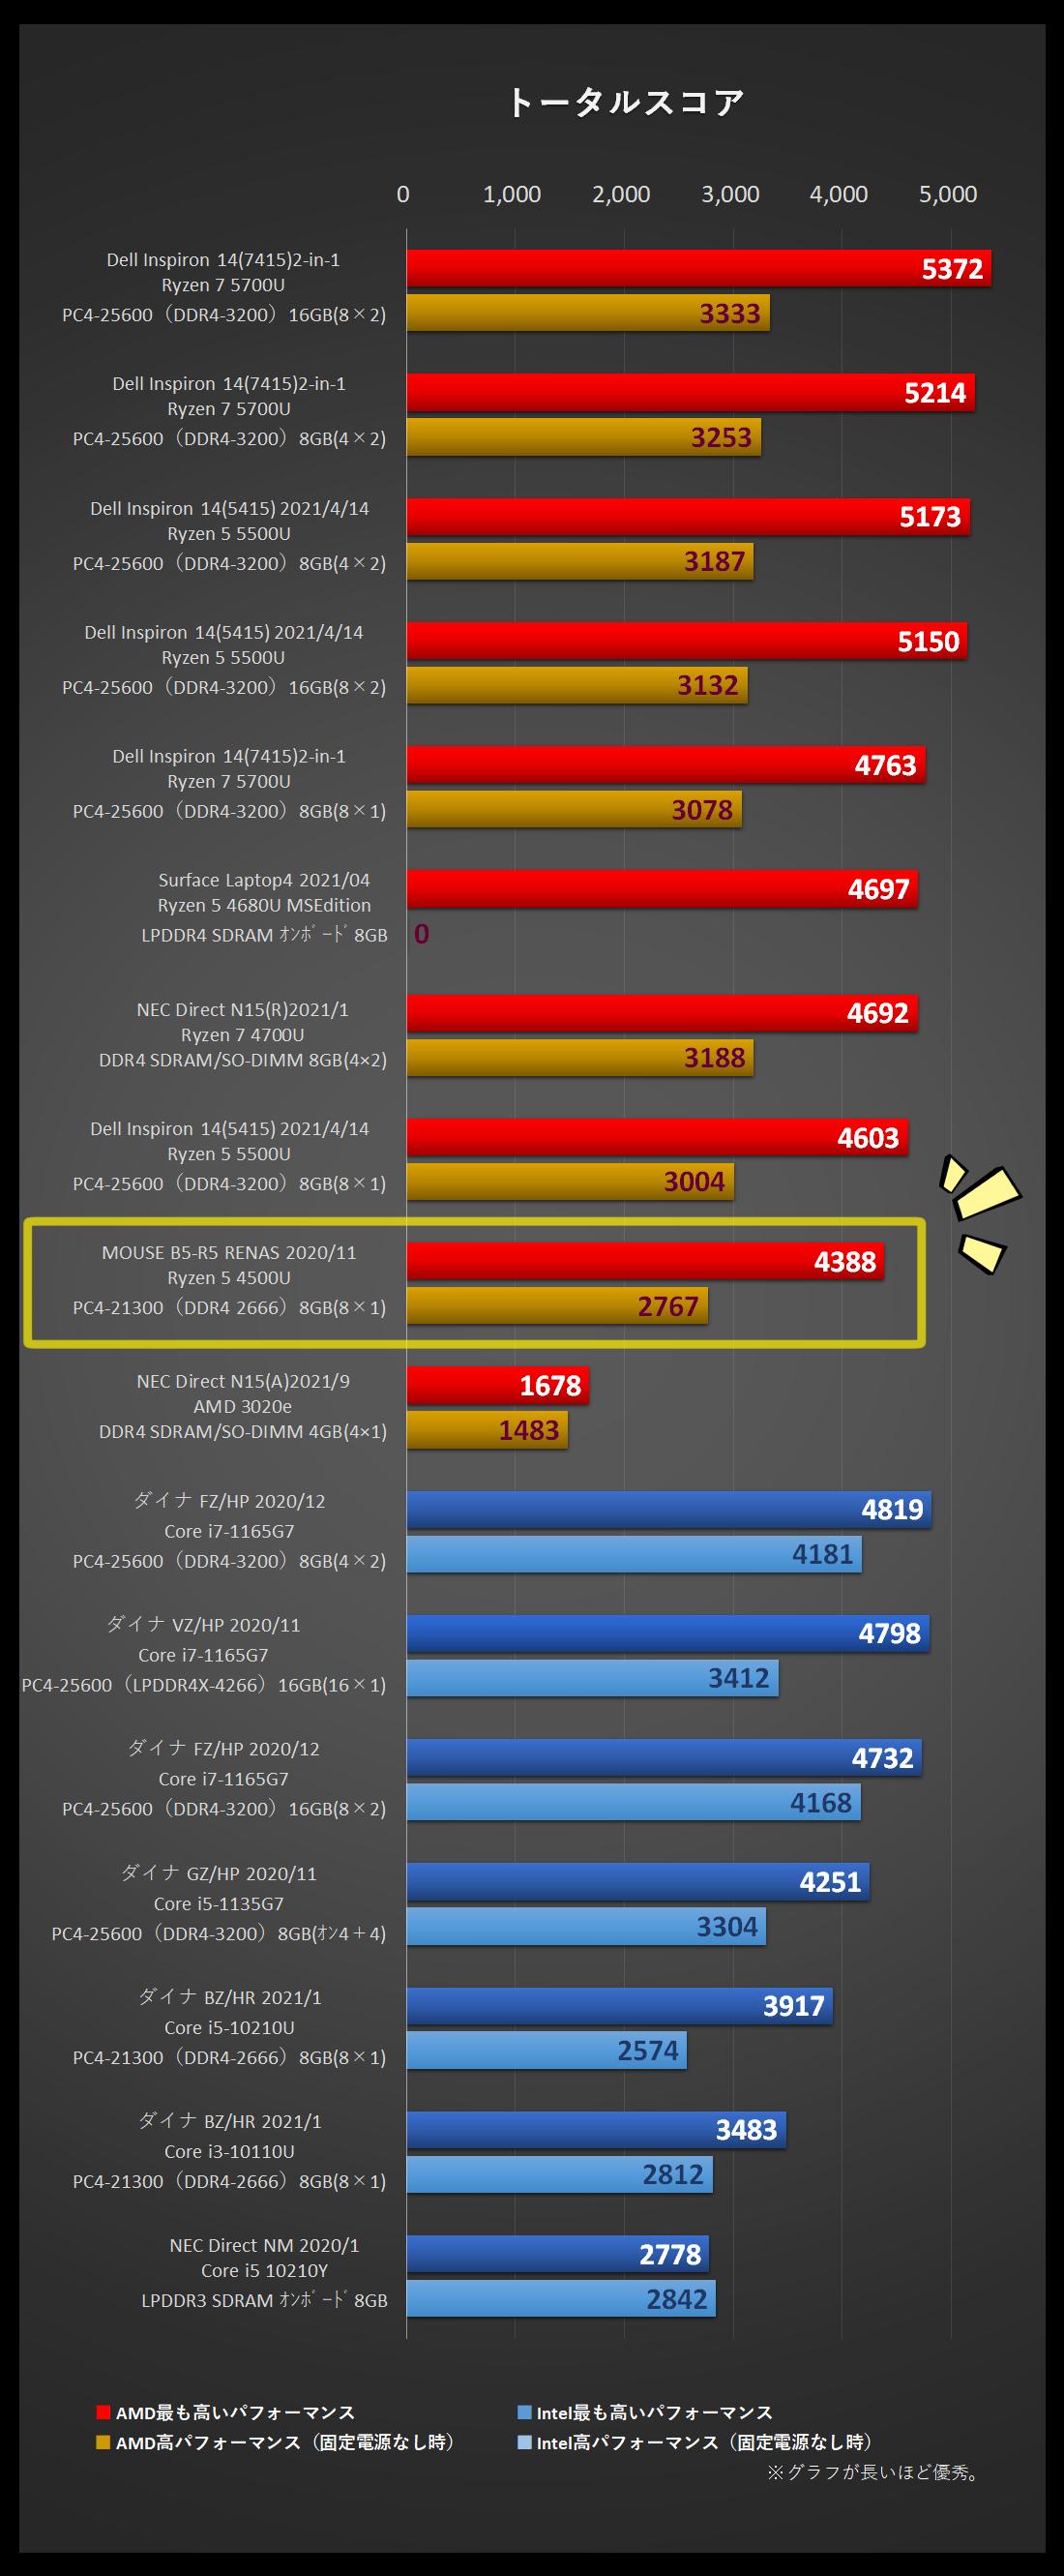 PCMark10、MOUSE「B5-R5」を組み入れたグラフ